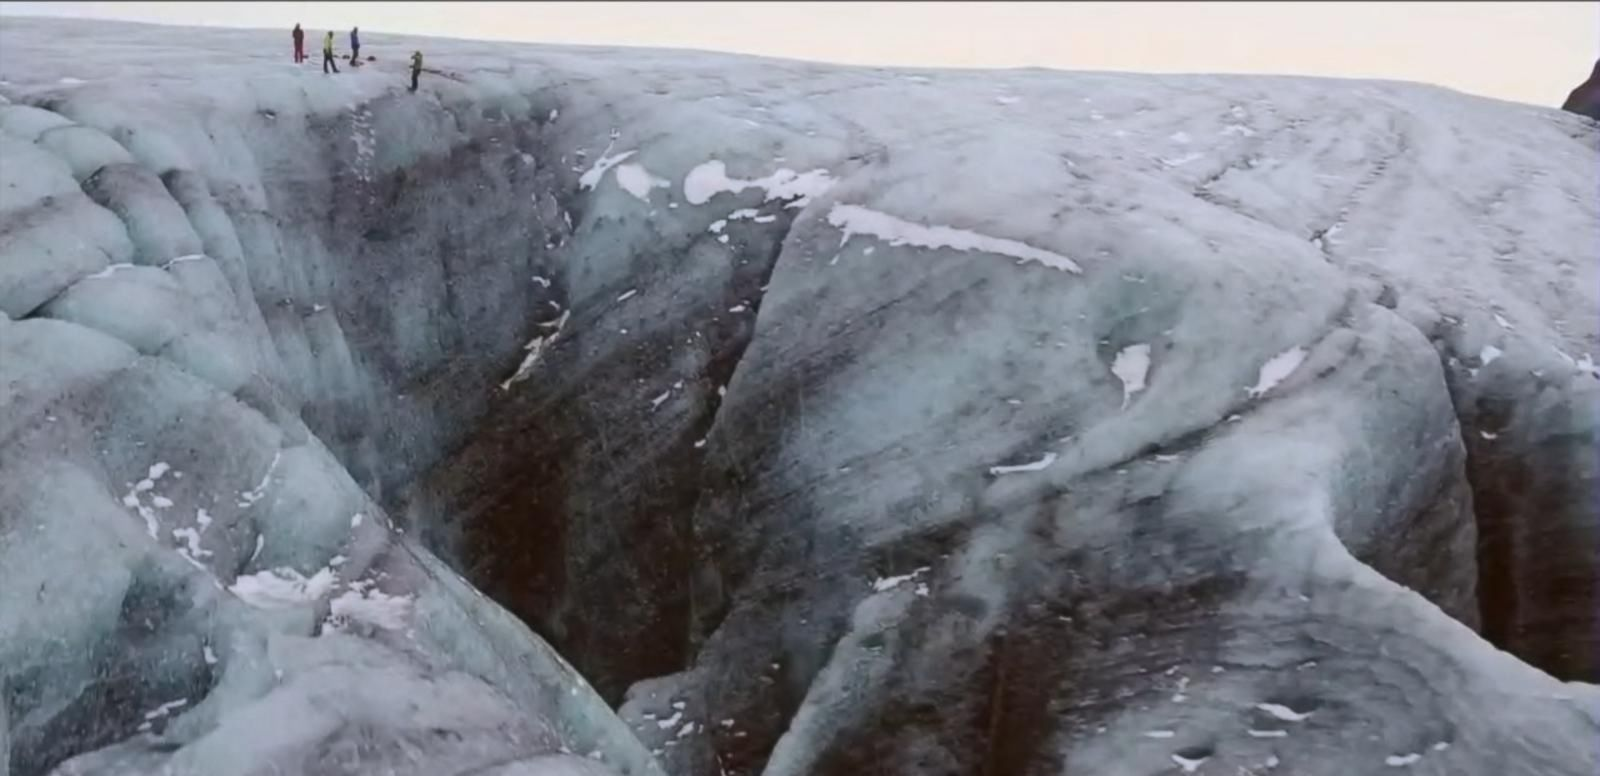 VIDEO: GMA Flies Drone Into Icelandic Sinkhole